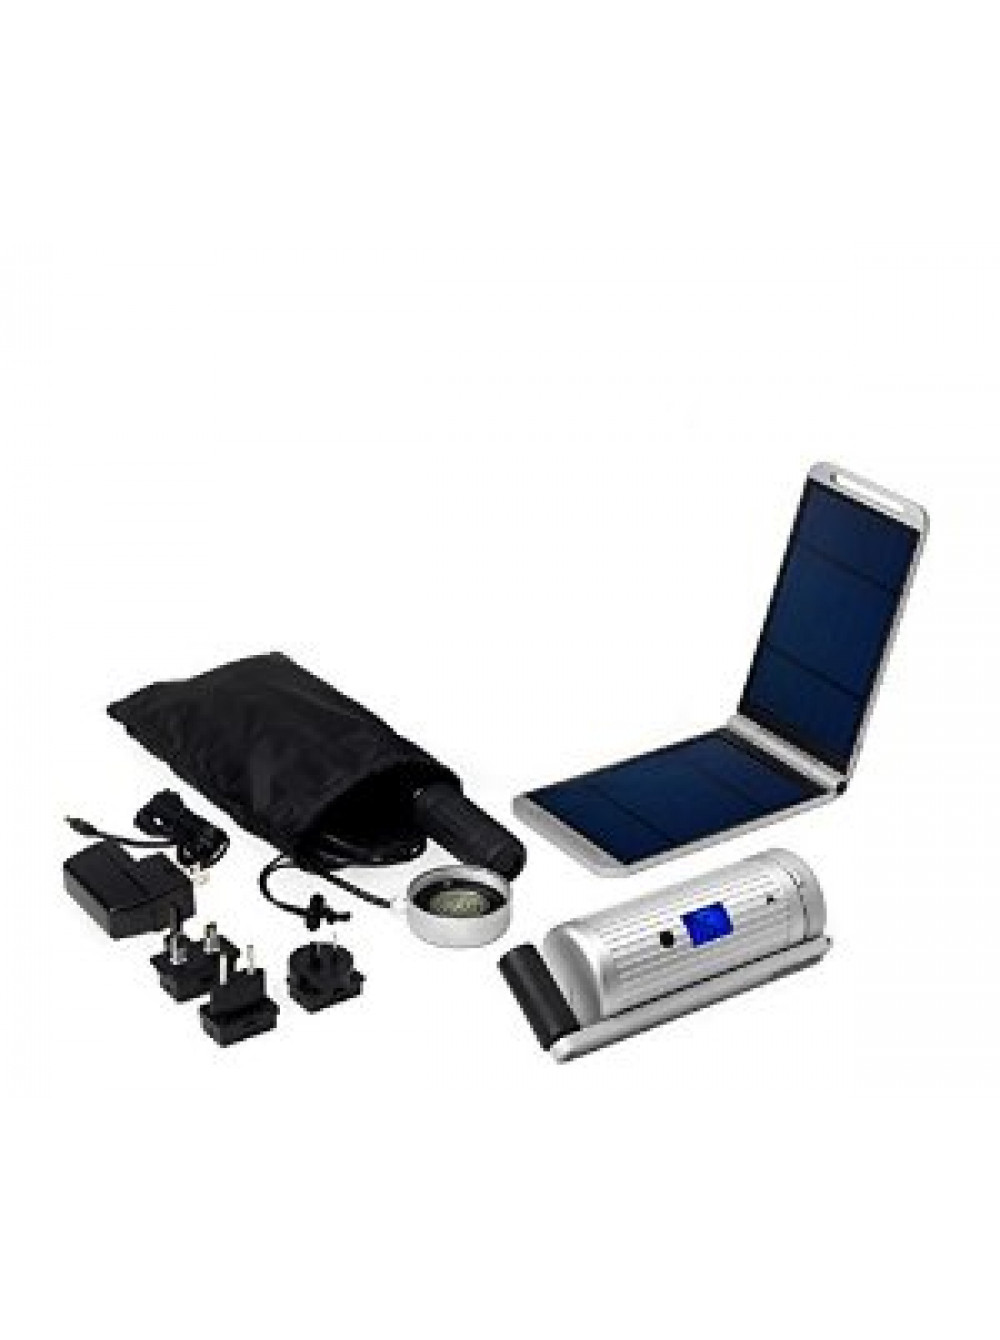 Powermonkey Expedition Hand crank - Solarmonkey - Silver Full kit